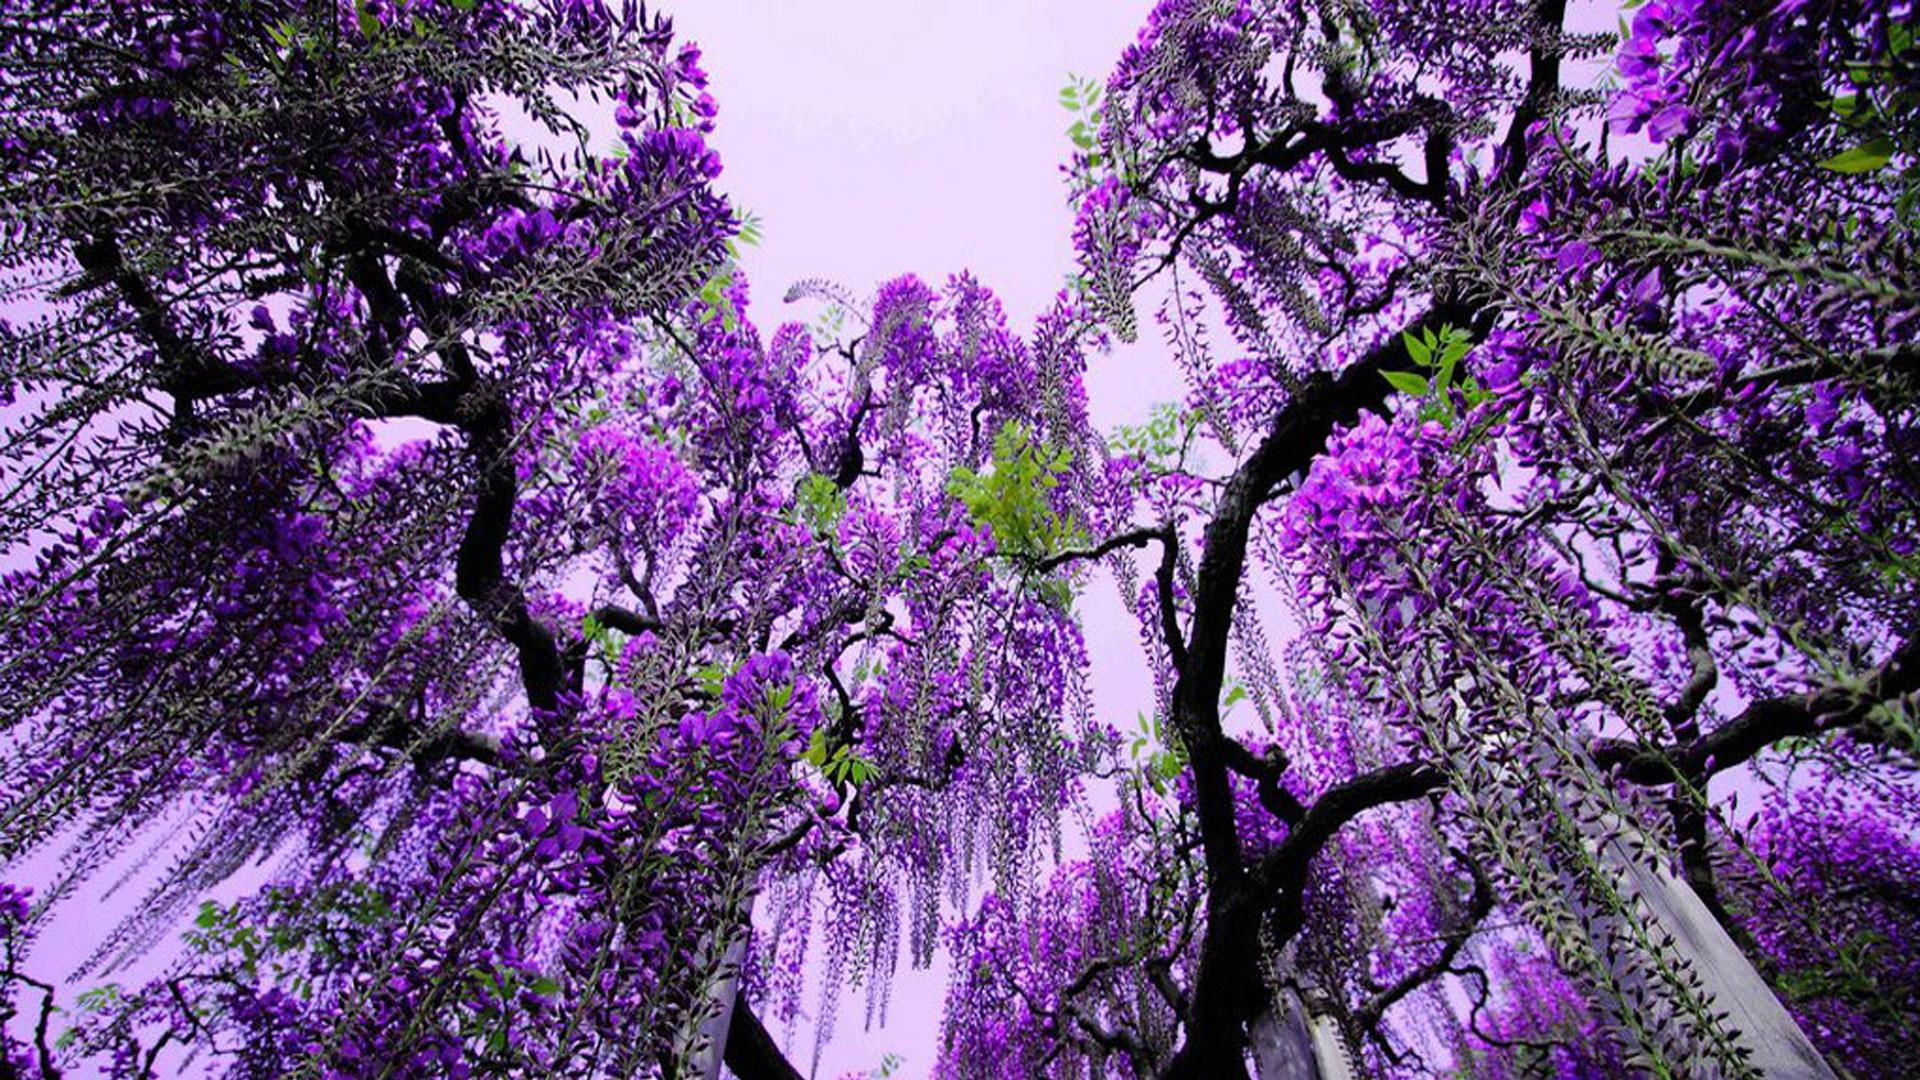 Purple Flowers Tree 3 Background - HdFlowerWallpaper.com